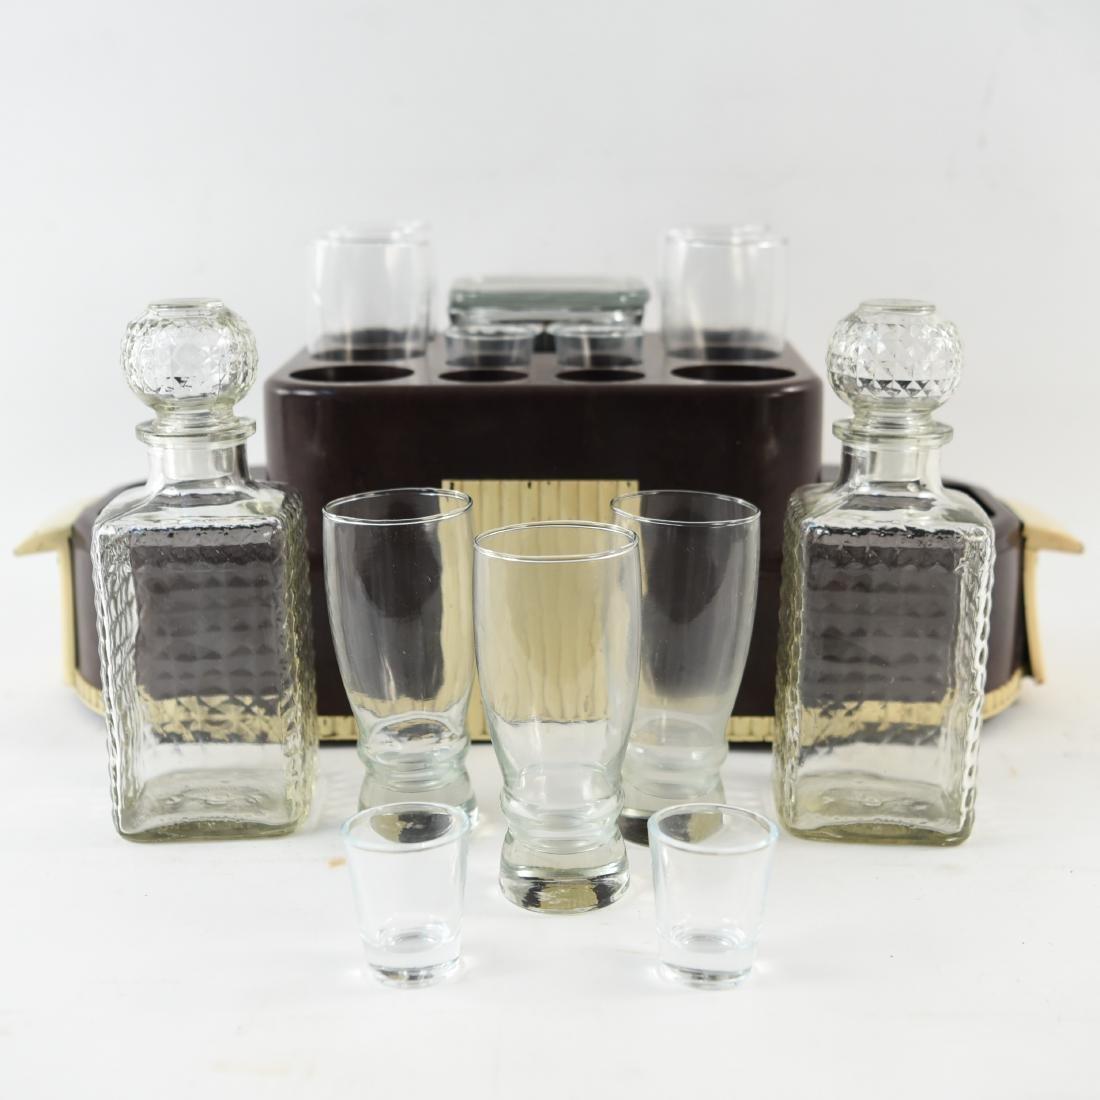 VINTAGE ART DECO LIQUOR DECANTER DRINK CADDY - 9